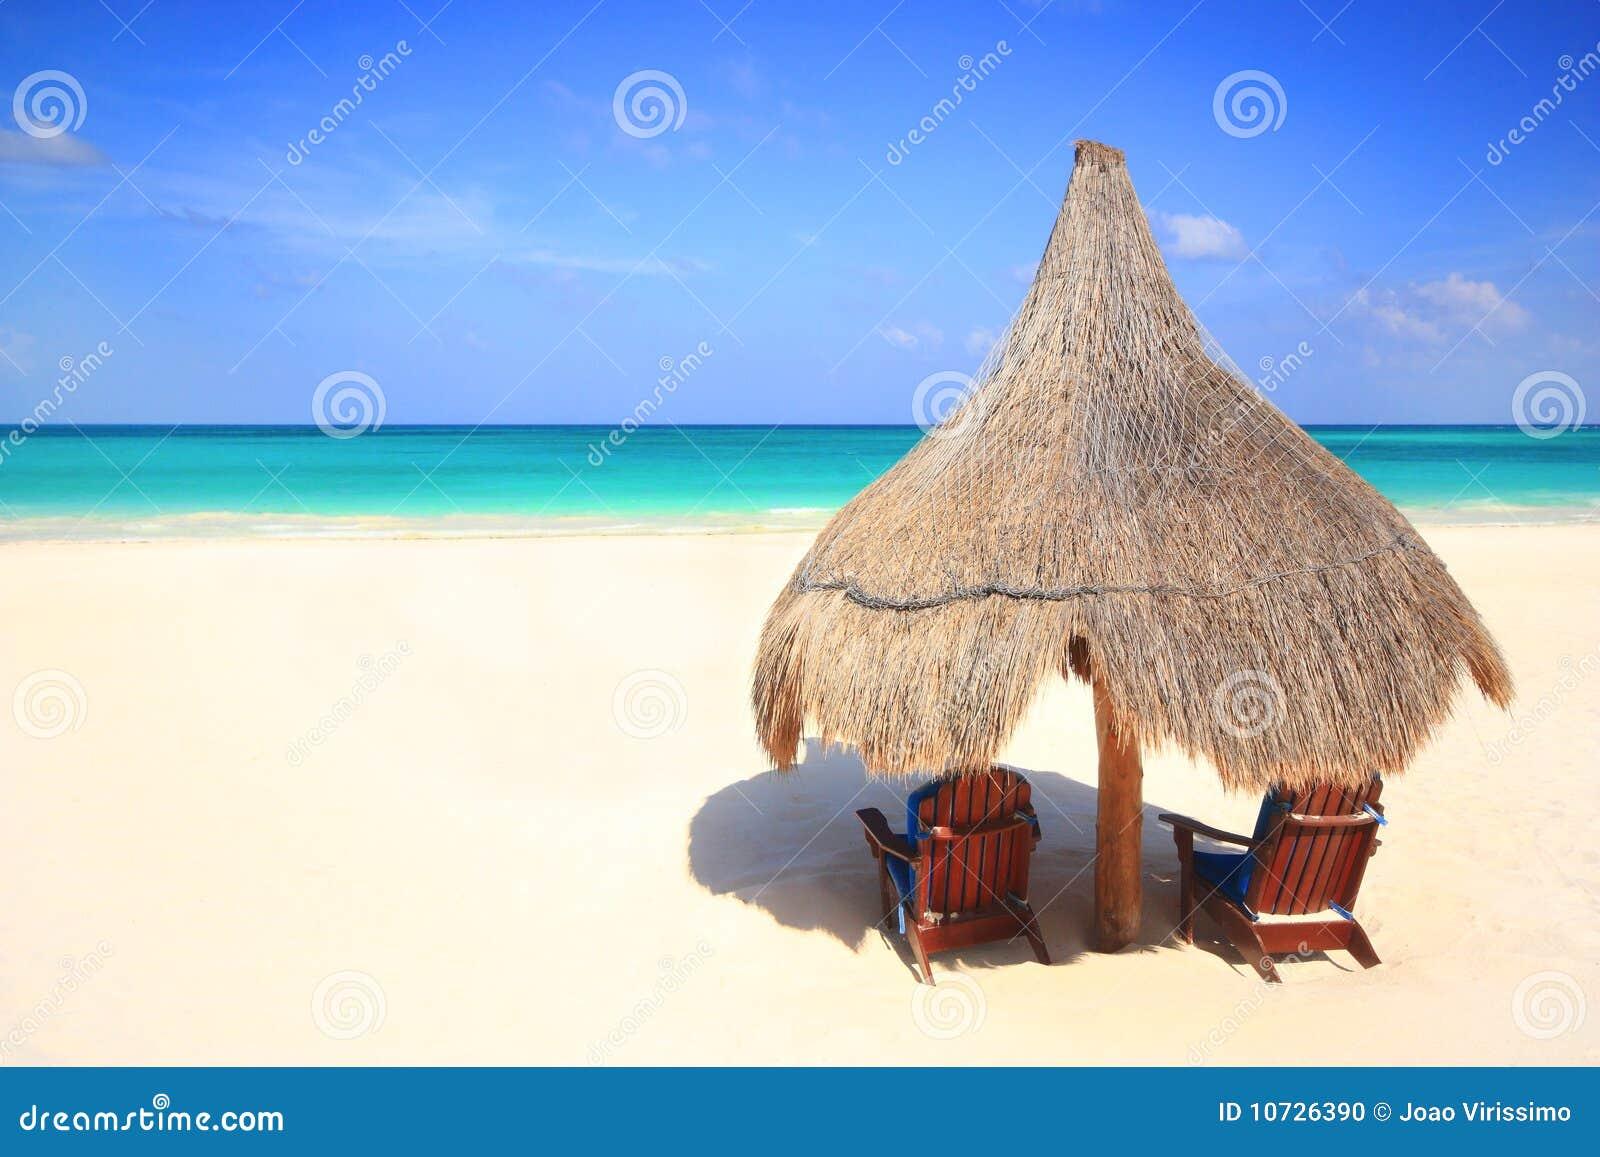 Beach umbrella and chair palapa thatch umbrella and